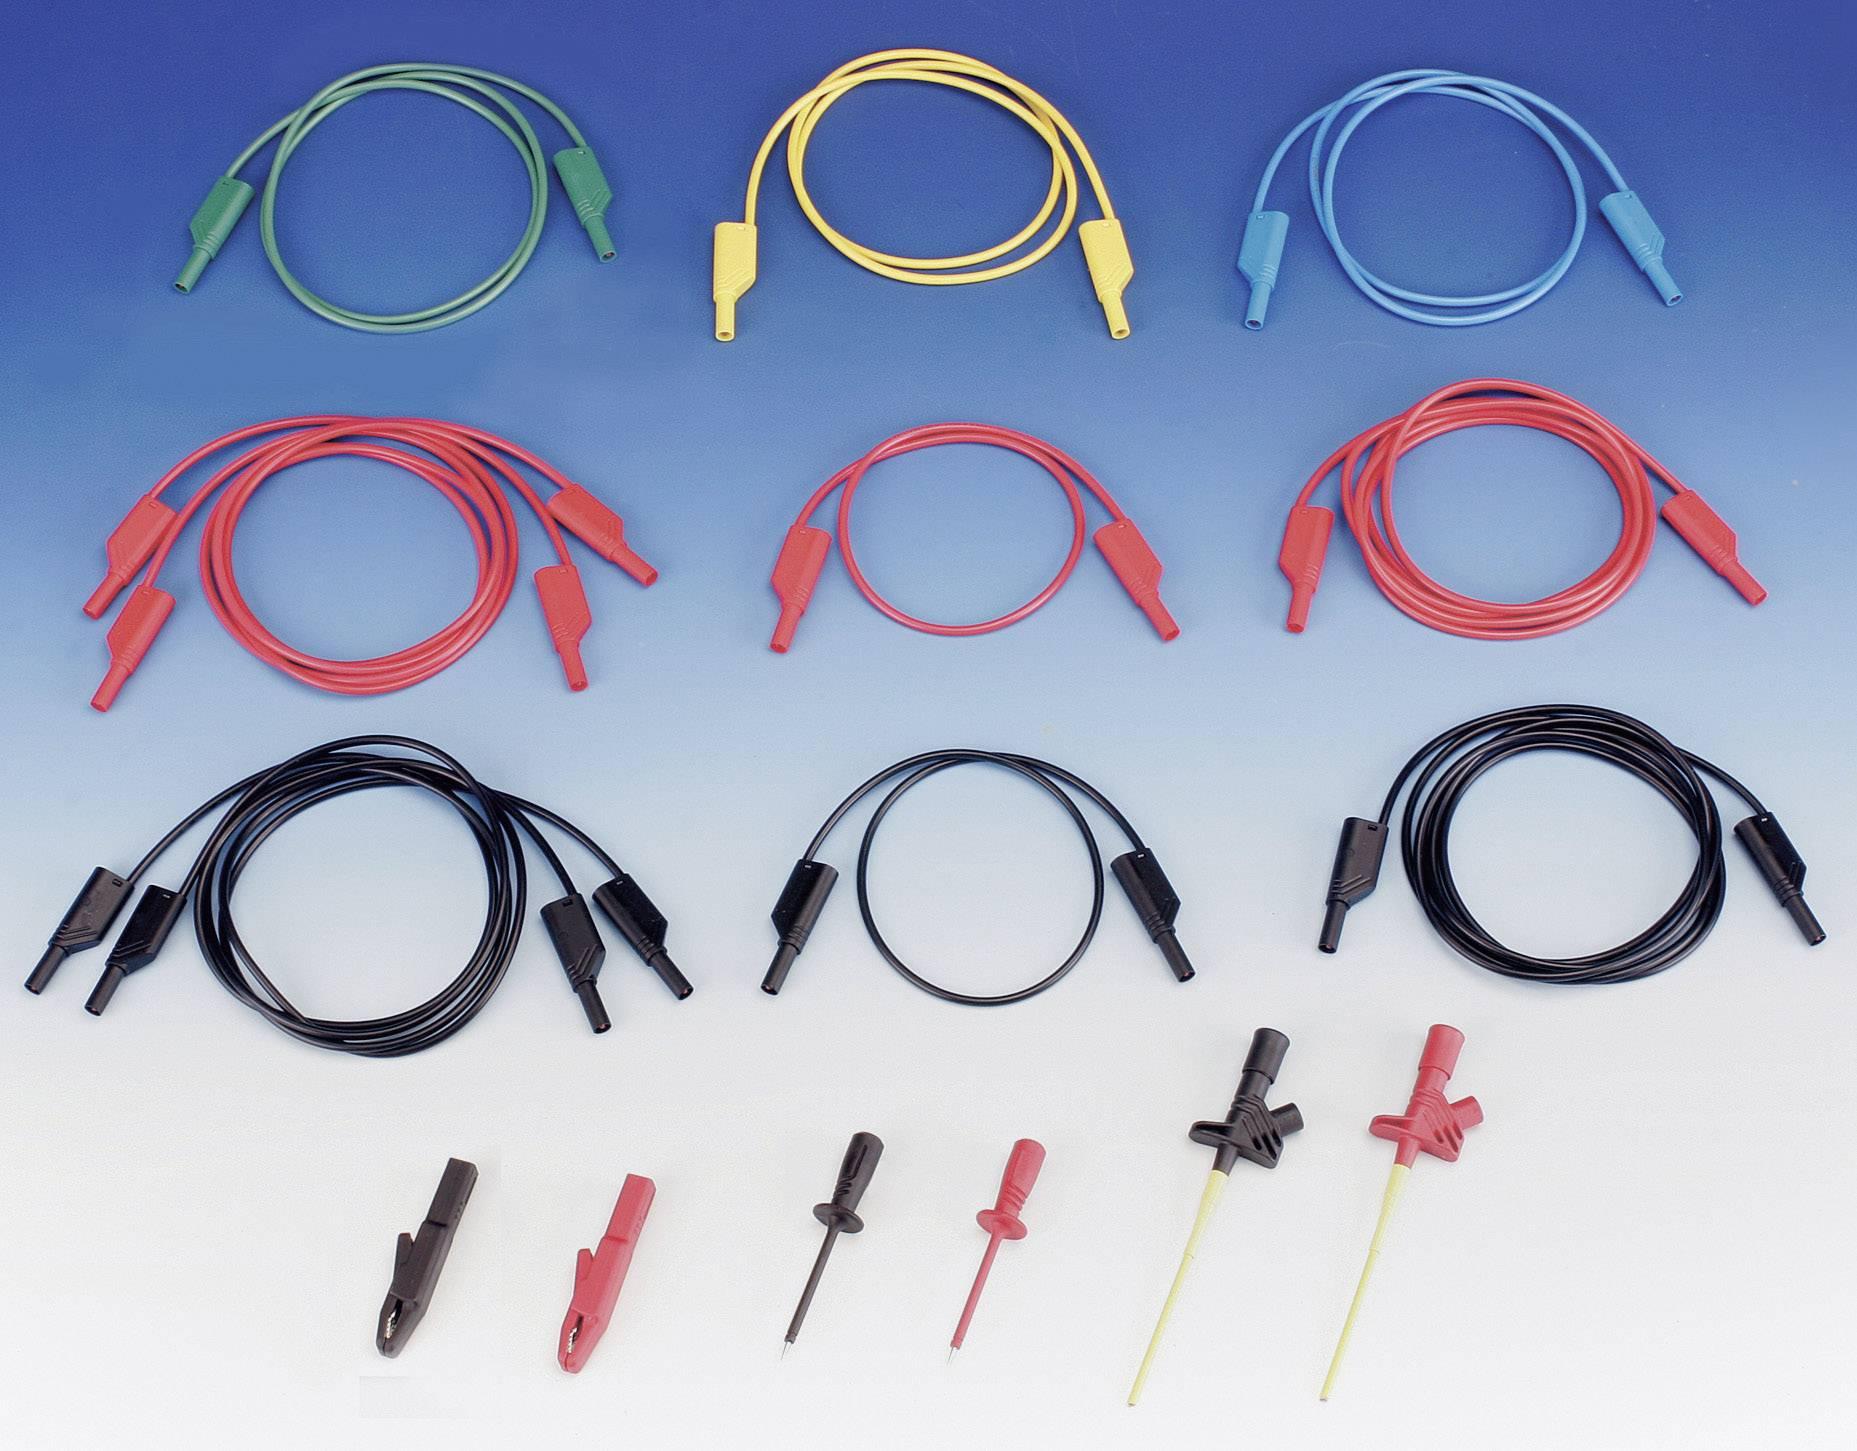 Sada měřicích kabelů banánek 4 mm ⇔ banánek 4 mm SKS Hirschmann CO MLS, 1 m